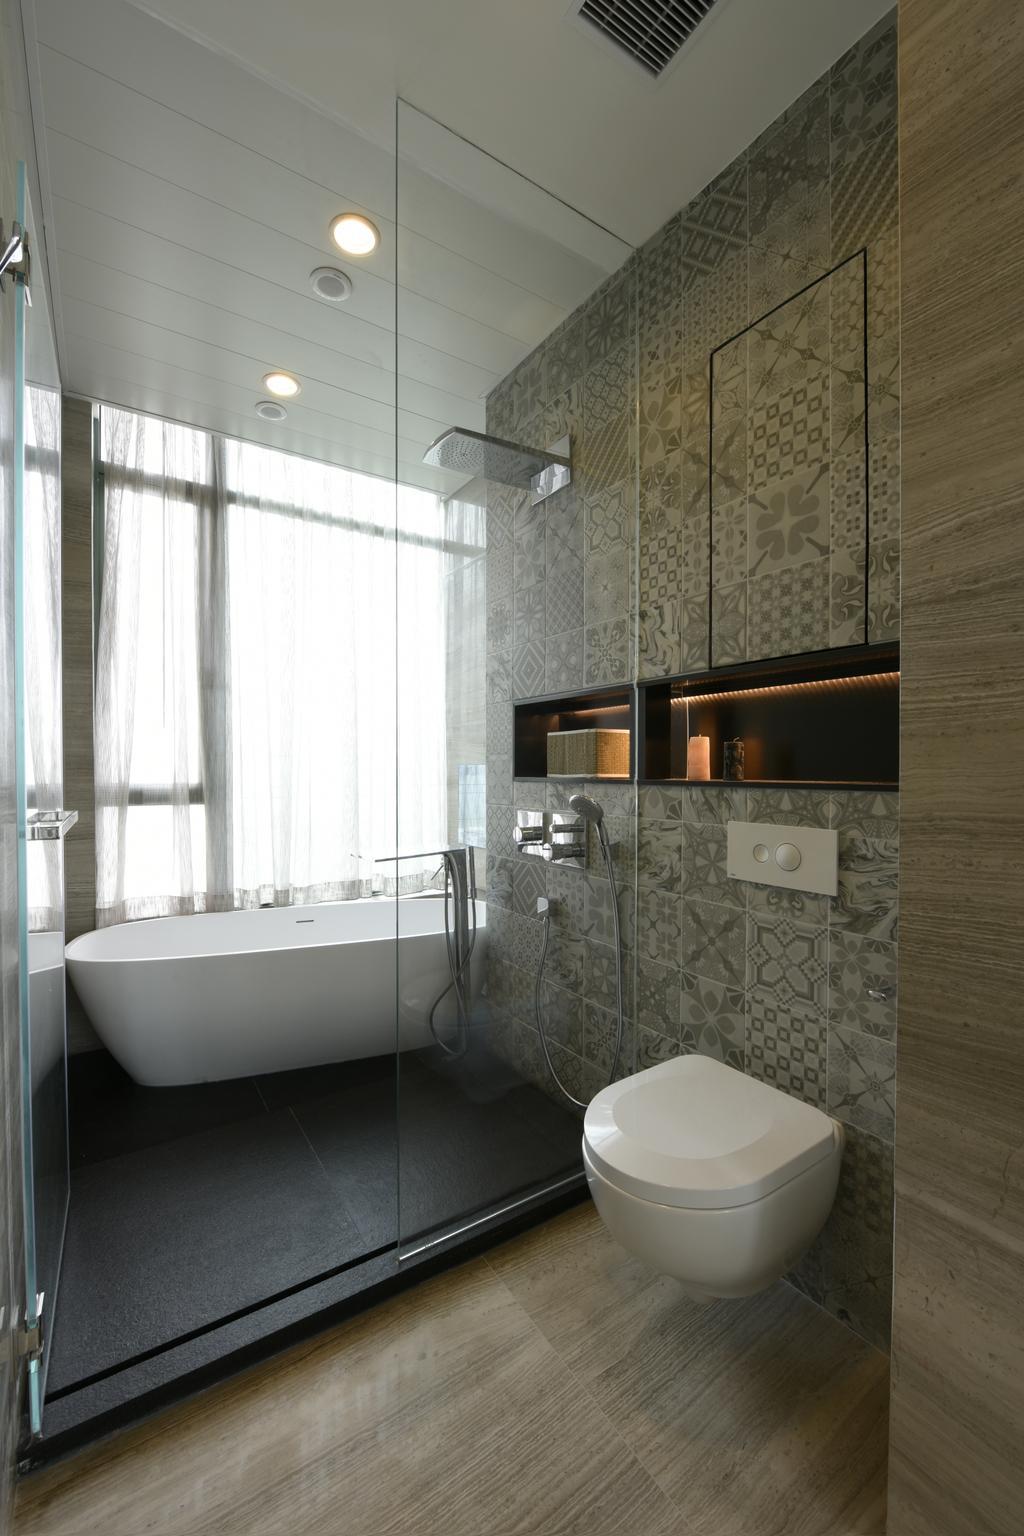 摩登, 私家樓, 浴室, Deerhill Bay, 室內設計師, 畫斯室內設計, 當代, 北歐, Indoors, Interior Design, Room